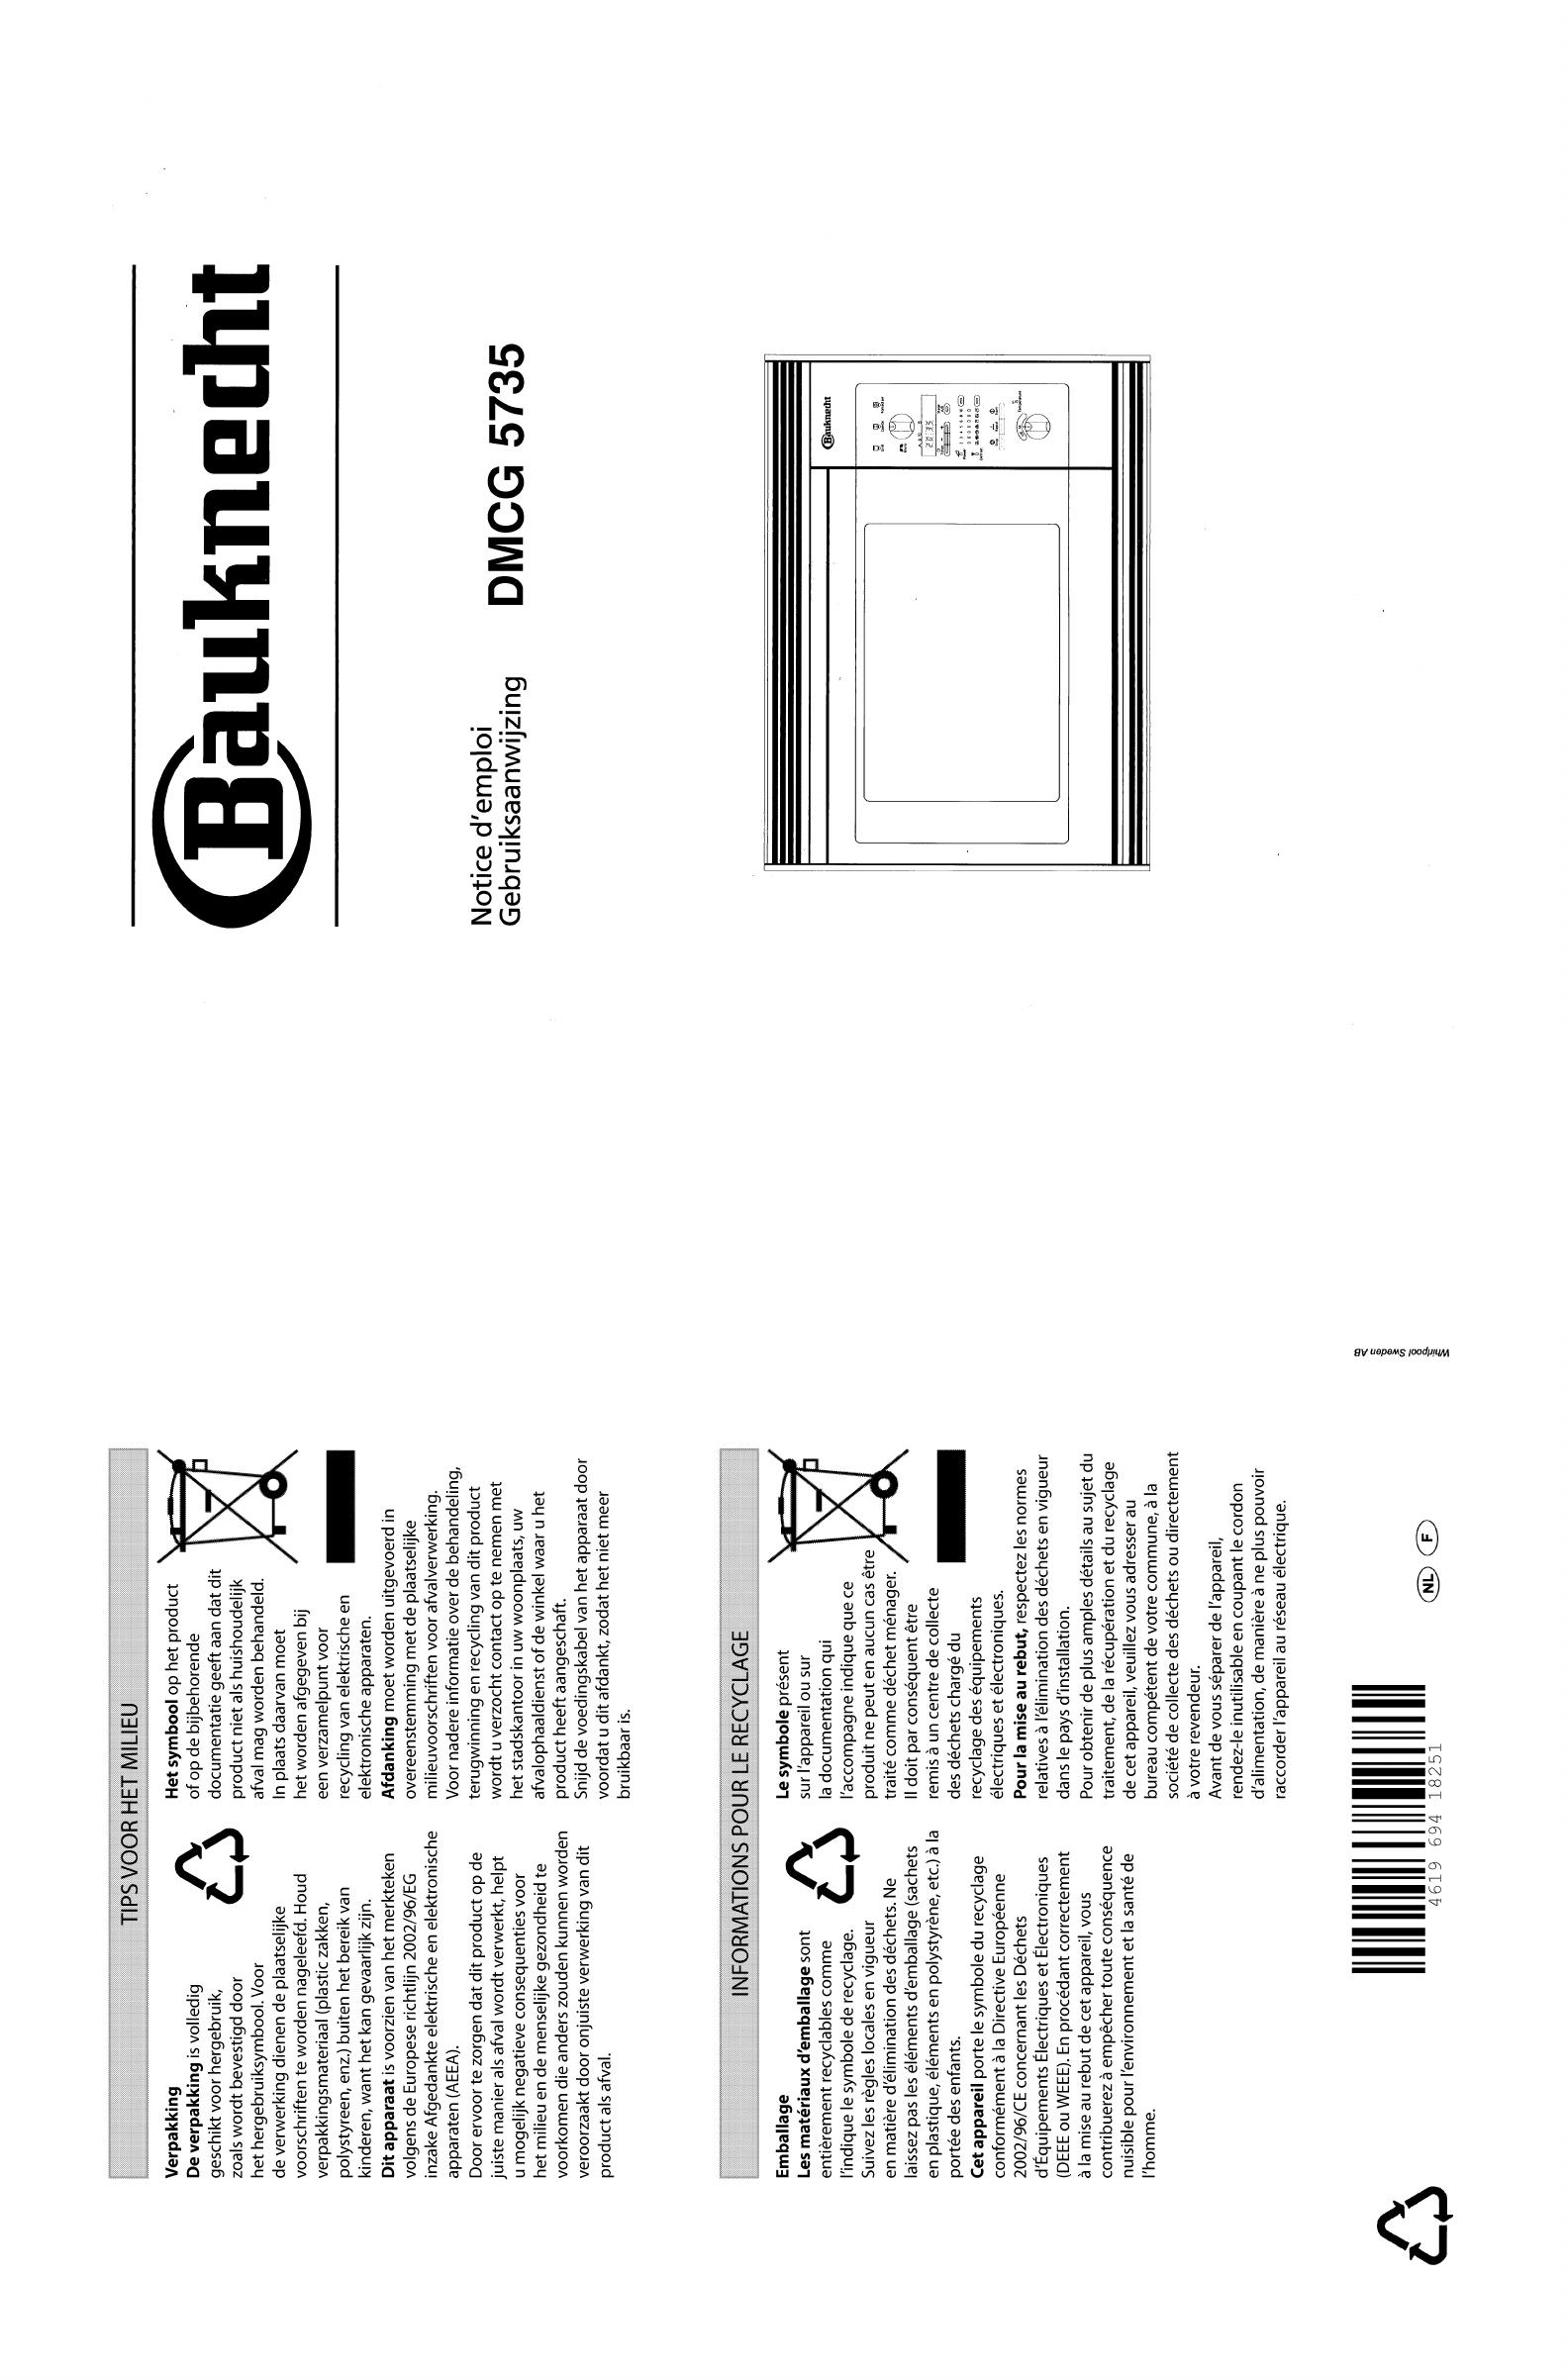 handleiding bauknecht dmcg 5735 pagina 1 van 28 fran ais nederlands. Black Bedroom Furniture Sets. Home Design Ideas